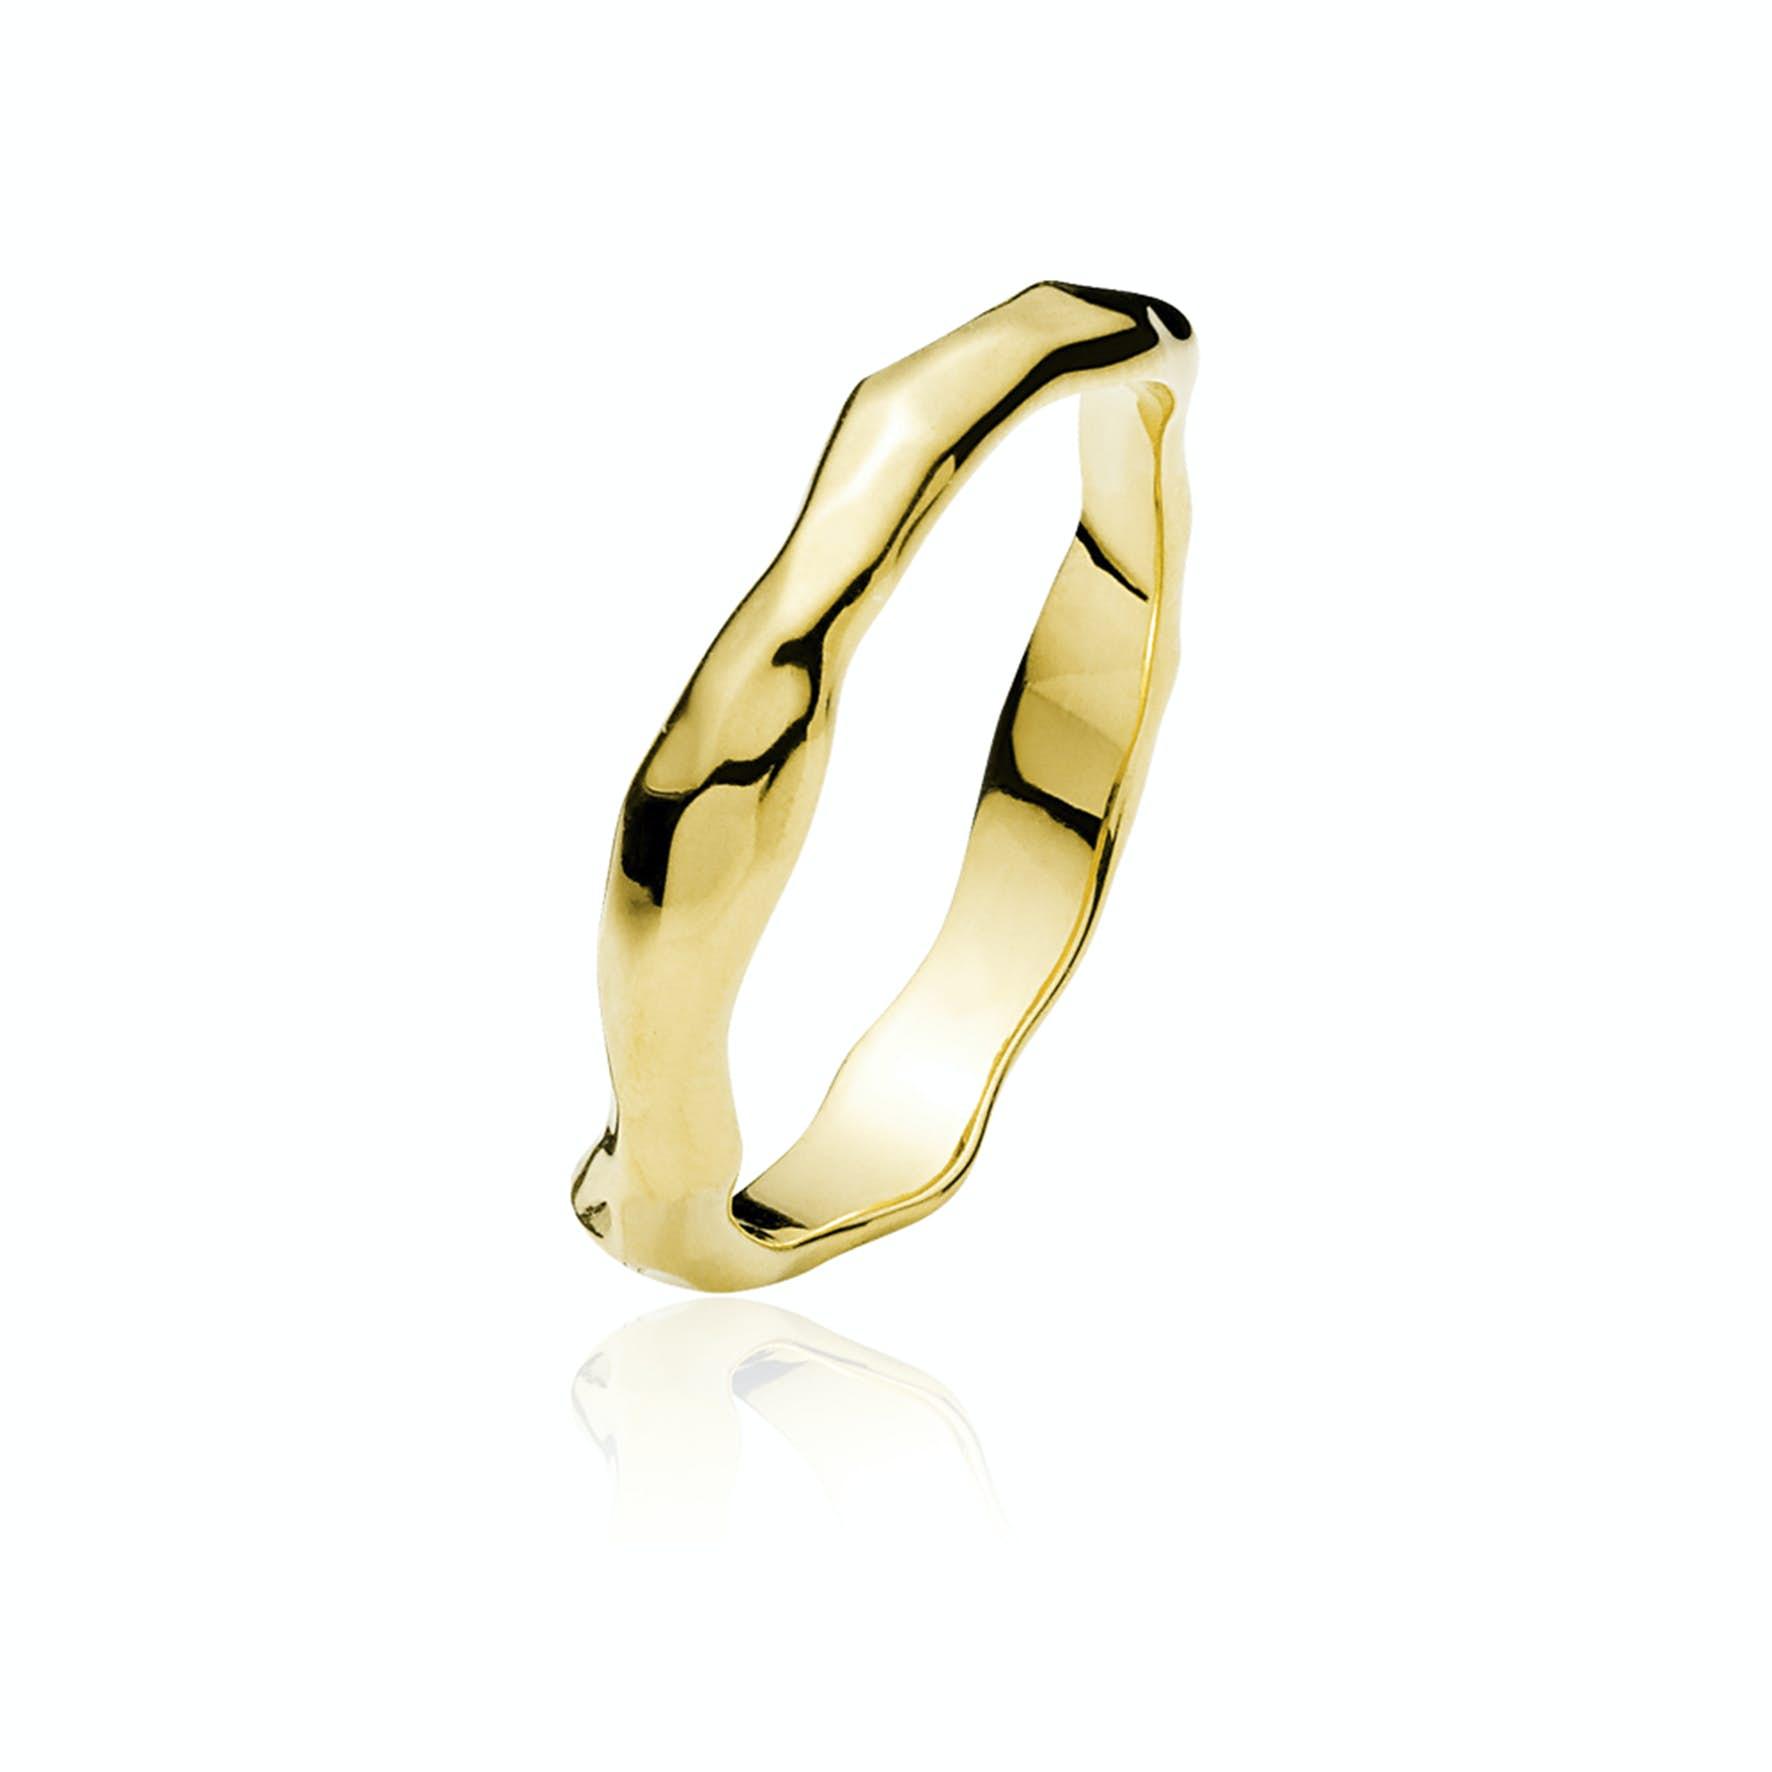 Emma Ring von Izabel Camille in Vergoldet-Silber Sterling 925